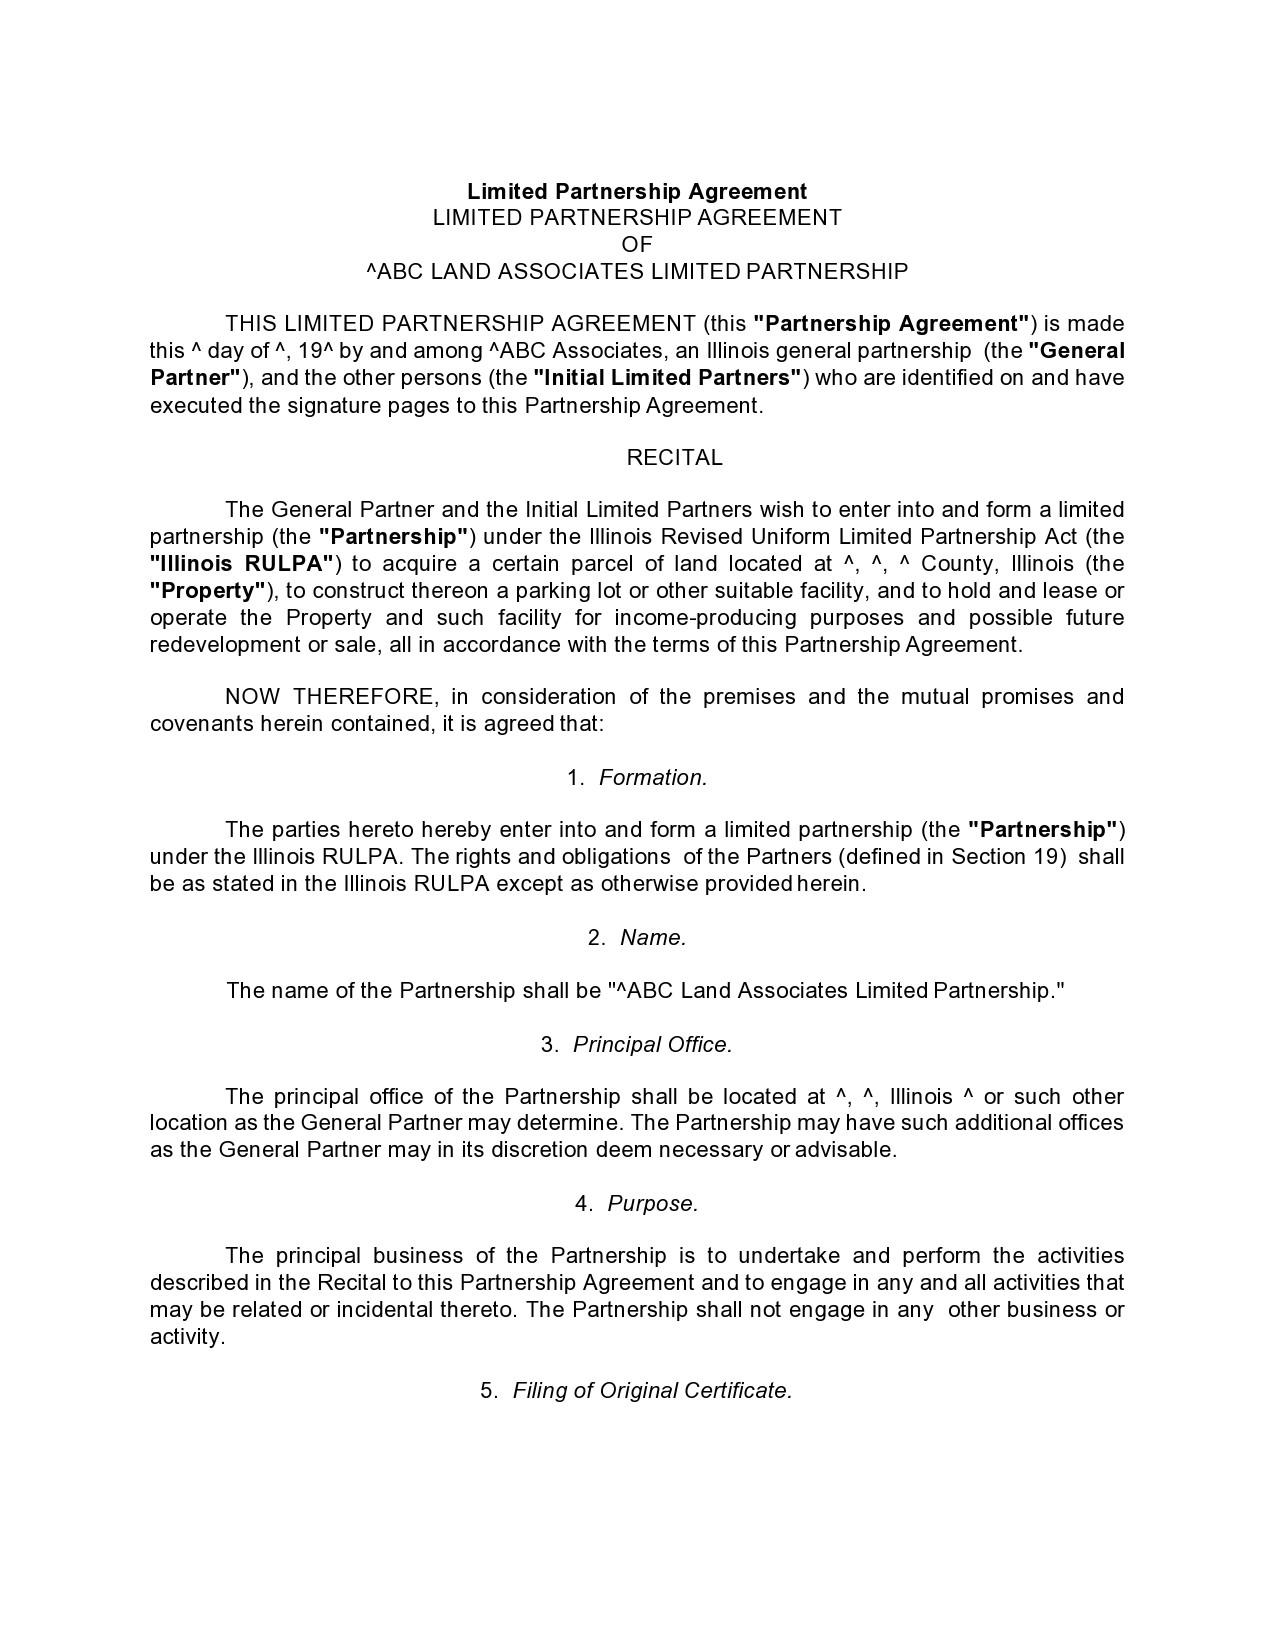 Free limited partnership agreement 17